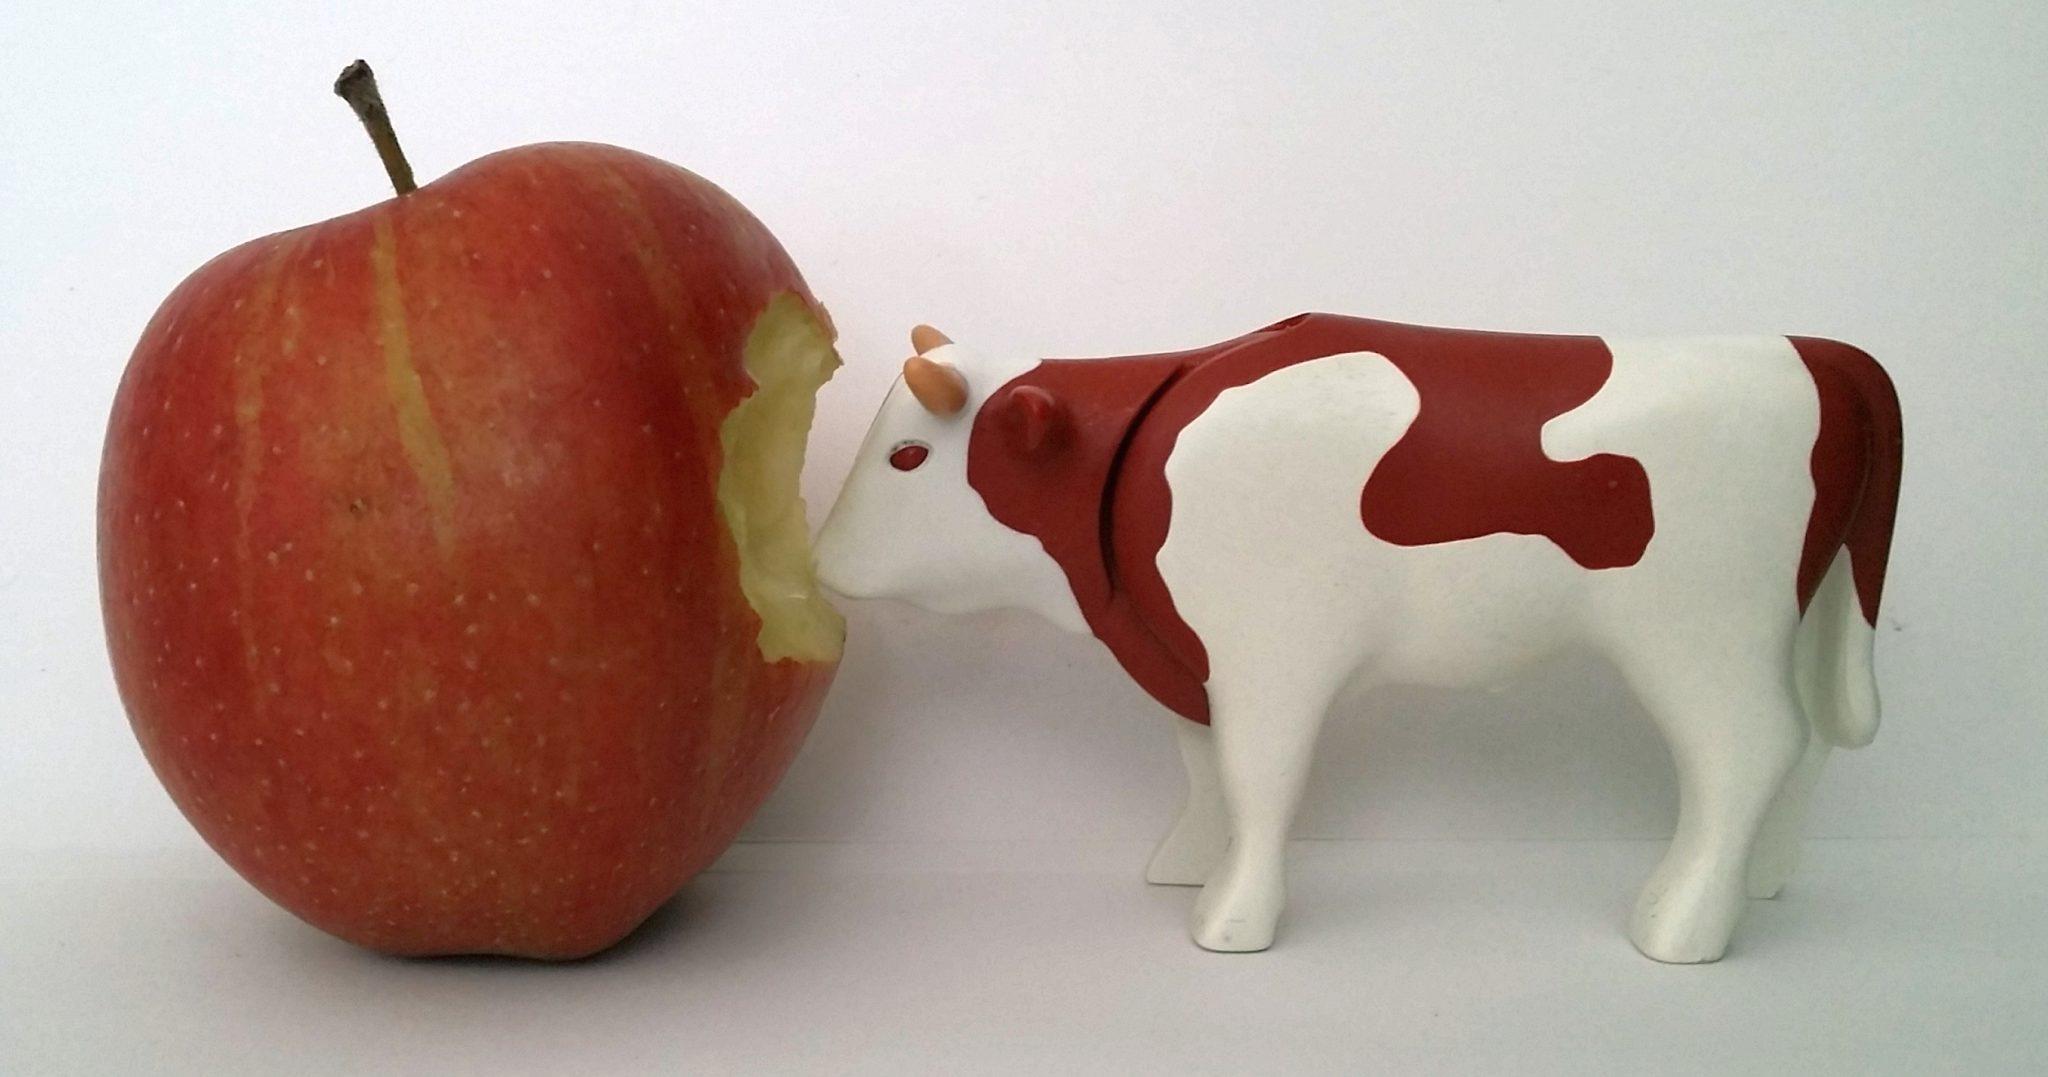 Plastikkuh knabbert an einem Apfel